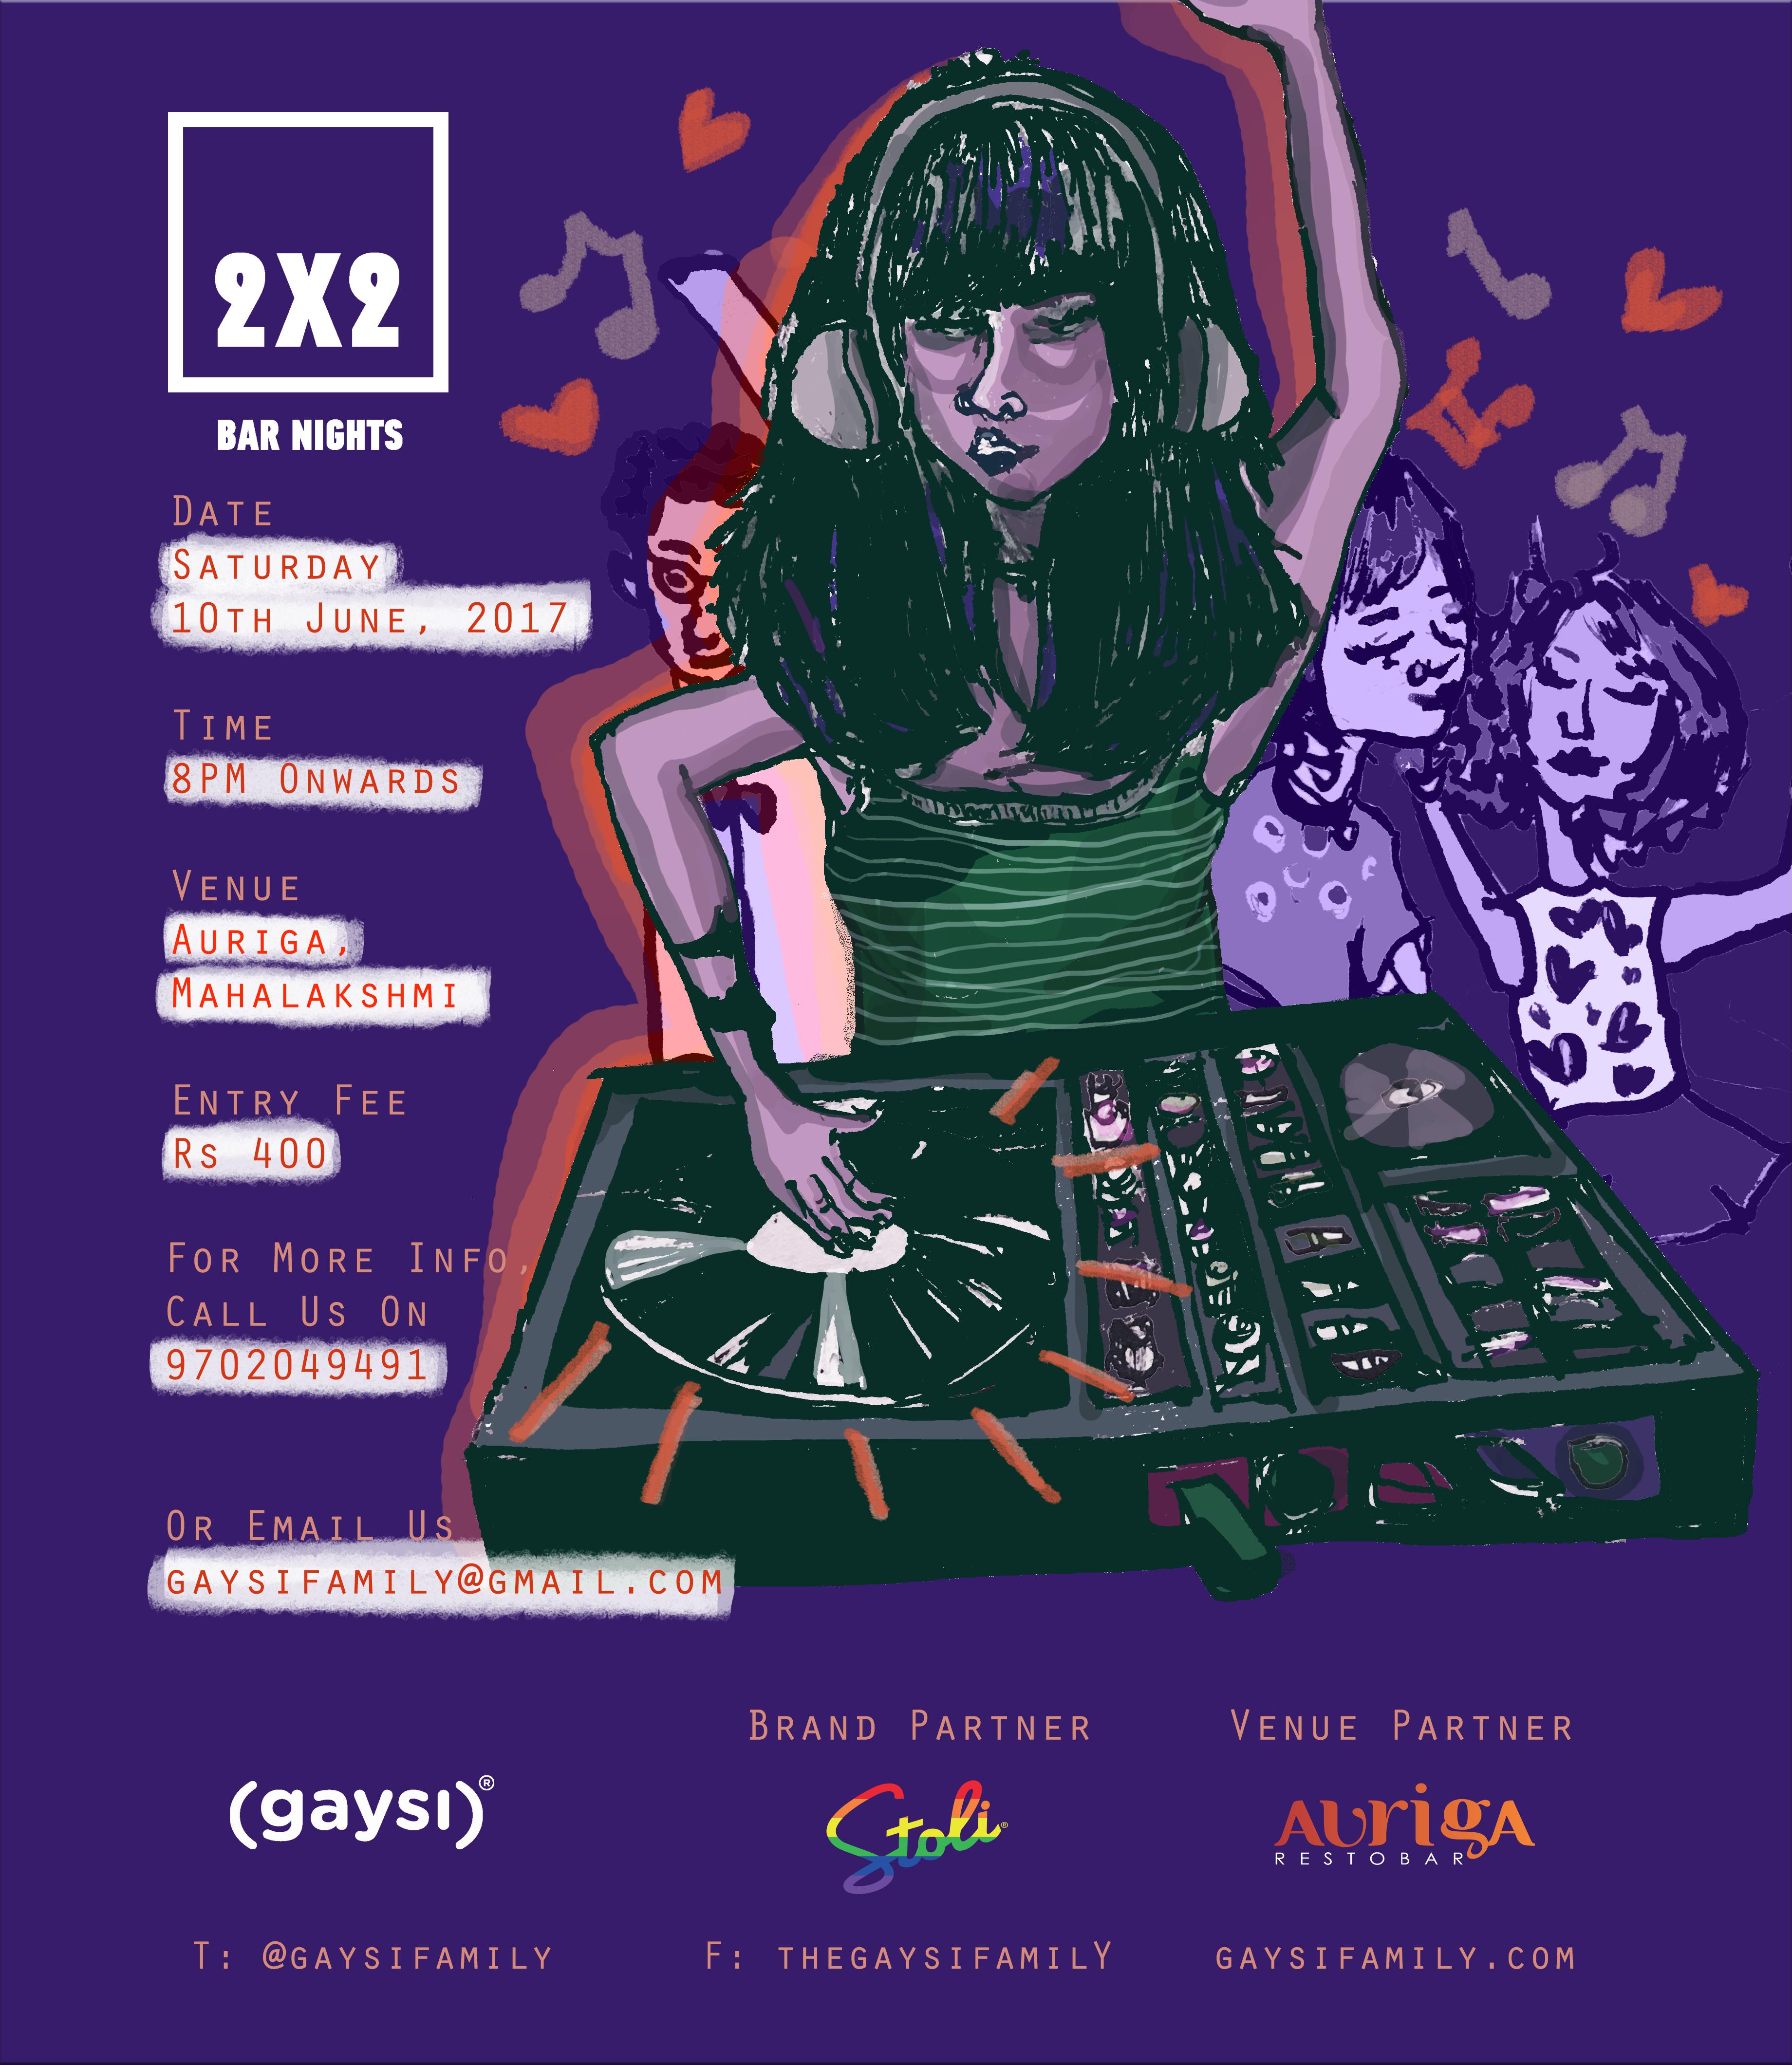 Stoli Vodka & Gaysi Presents 2×2 Bar Night: The Summer-Chord